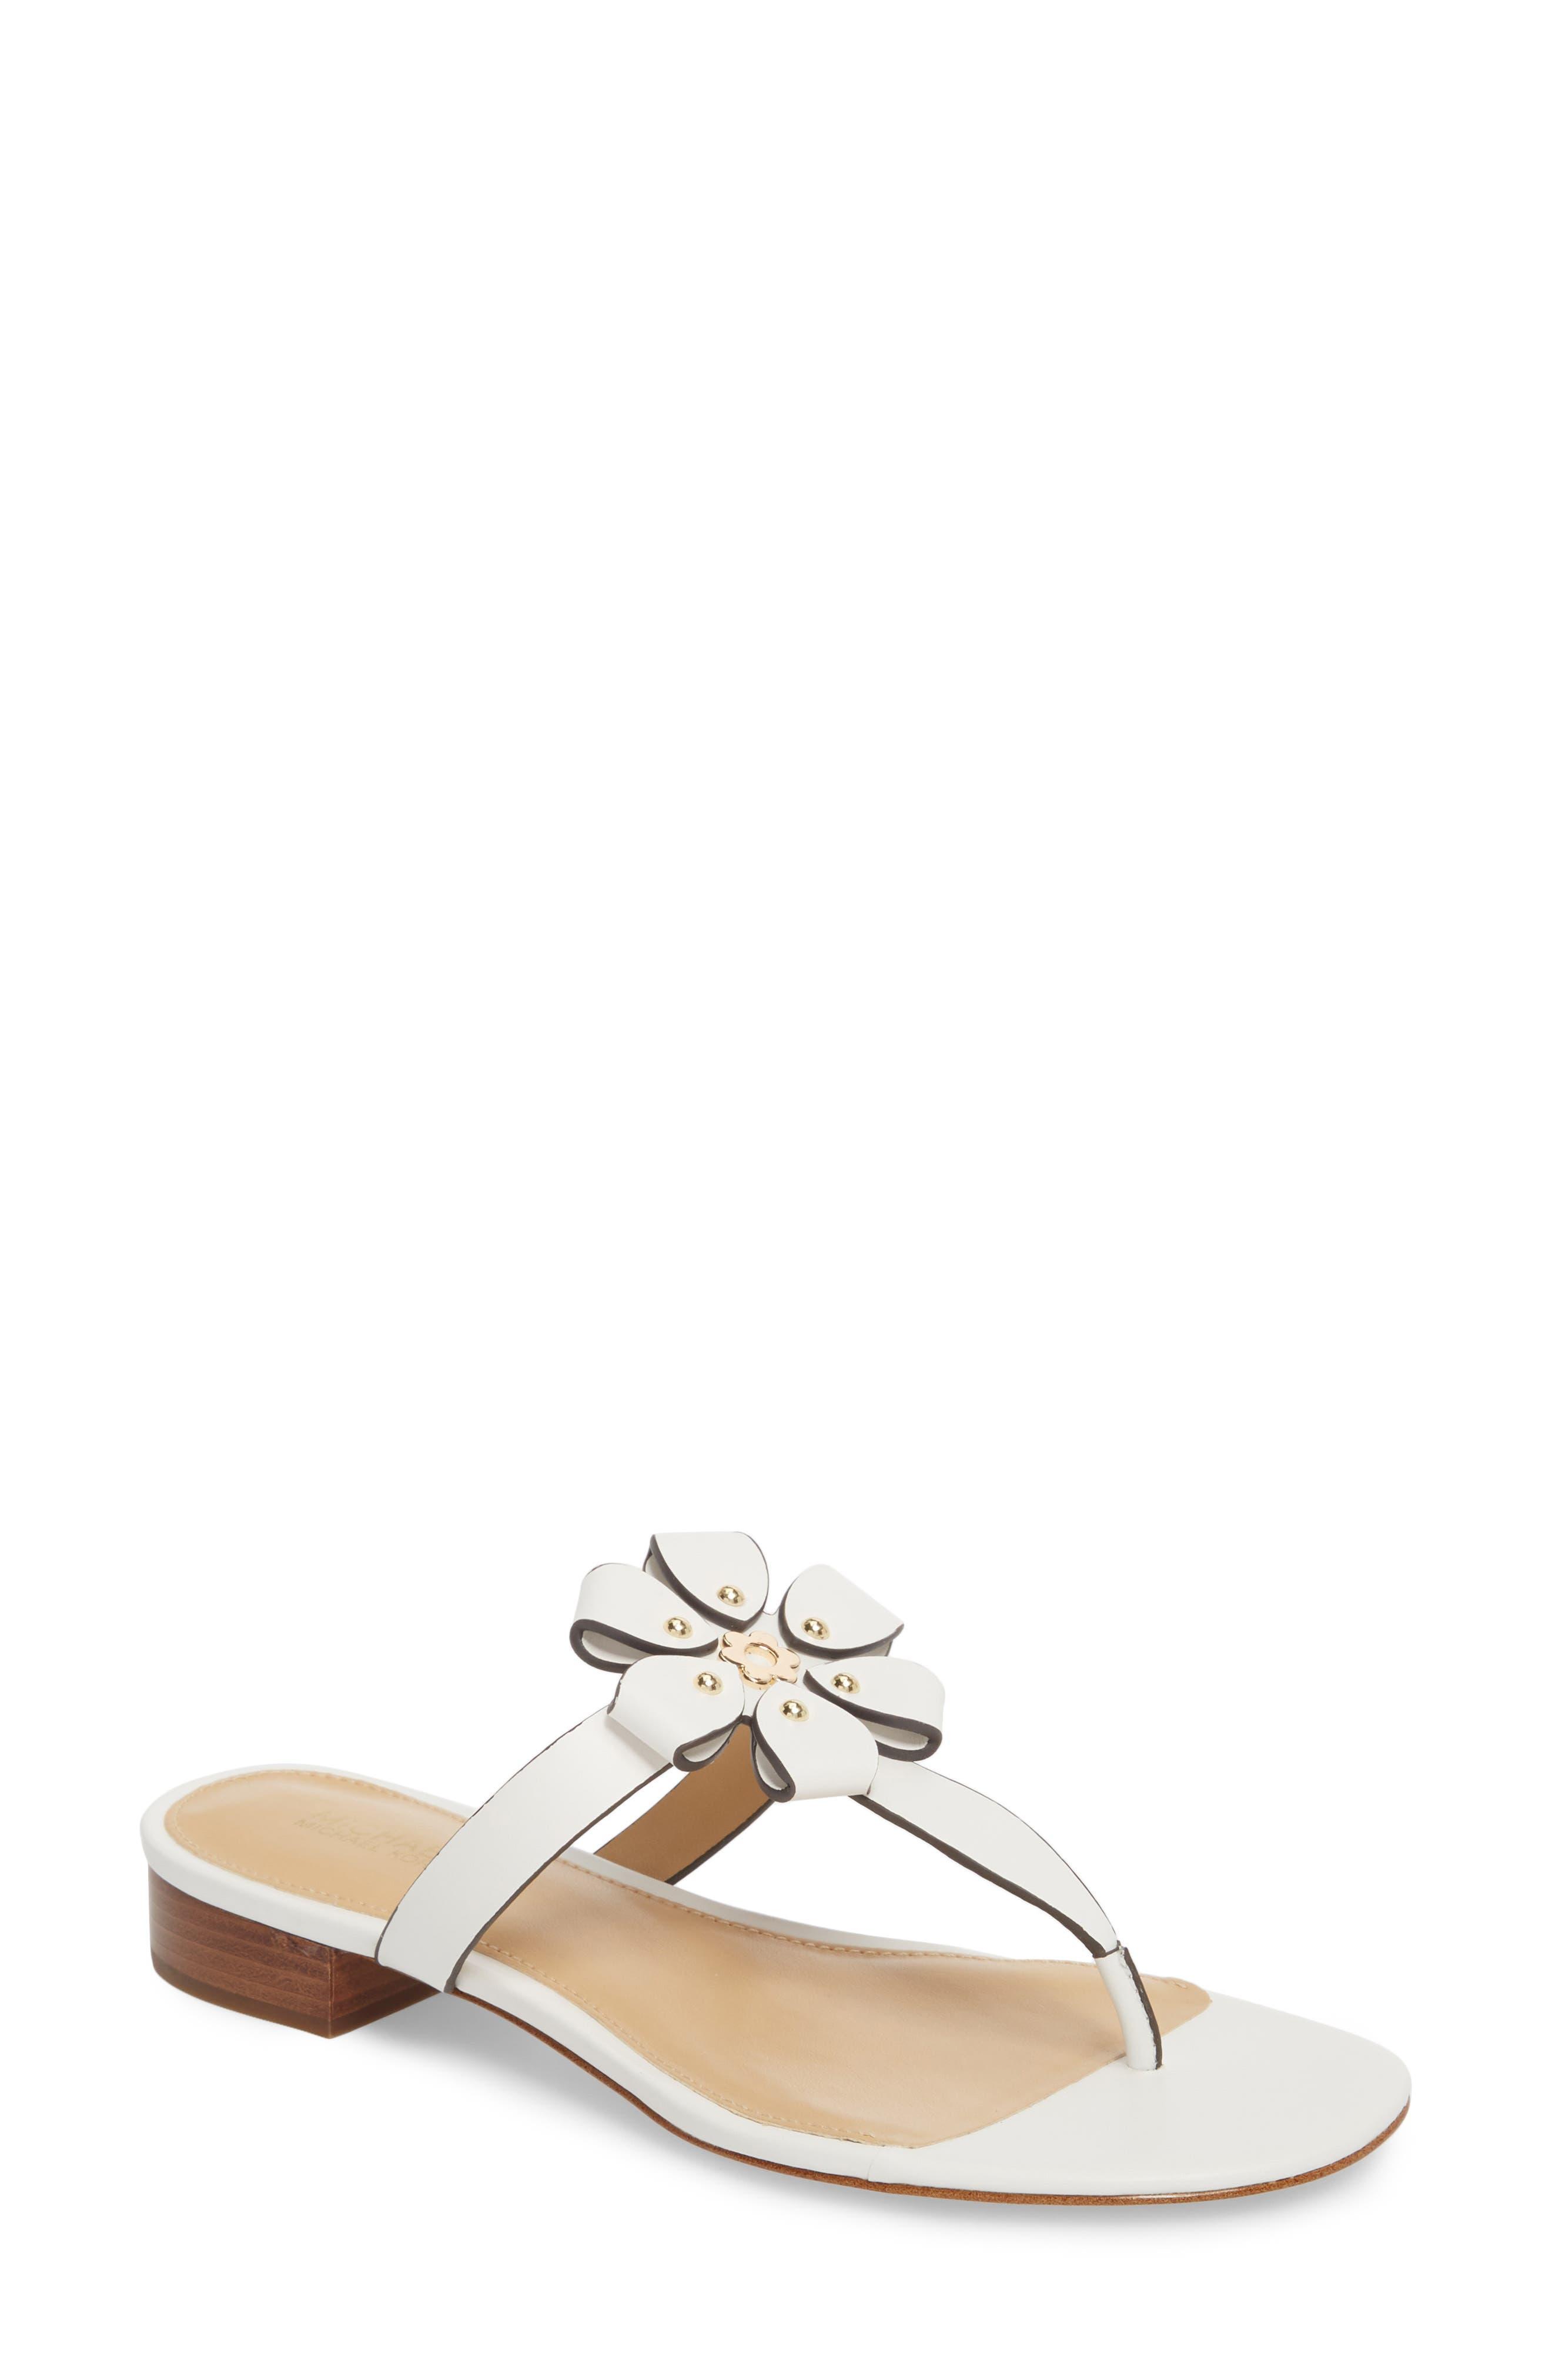 Tara Flip Flop,                         Main,                         color, Optic White Leather